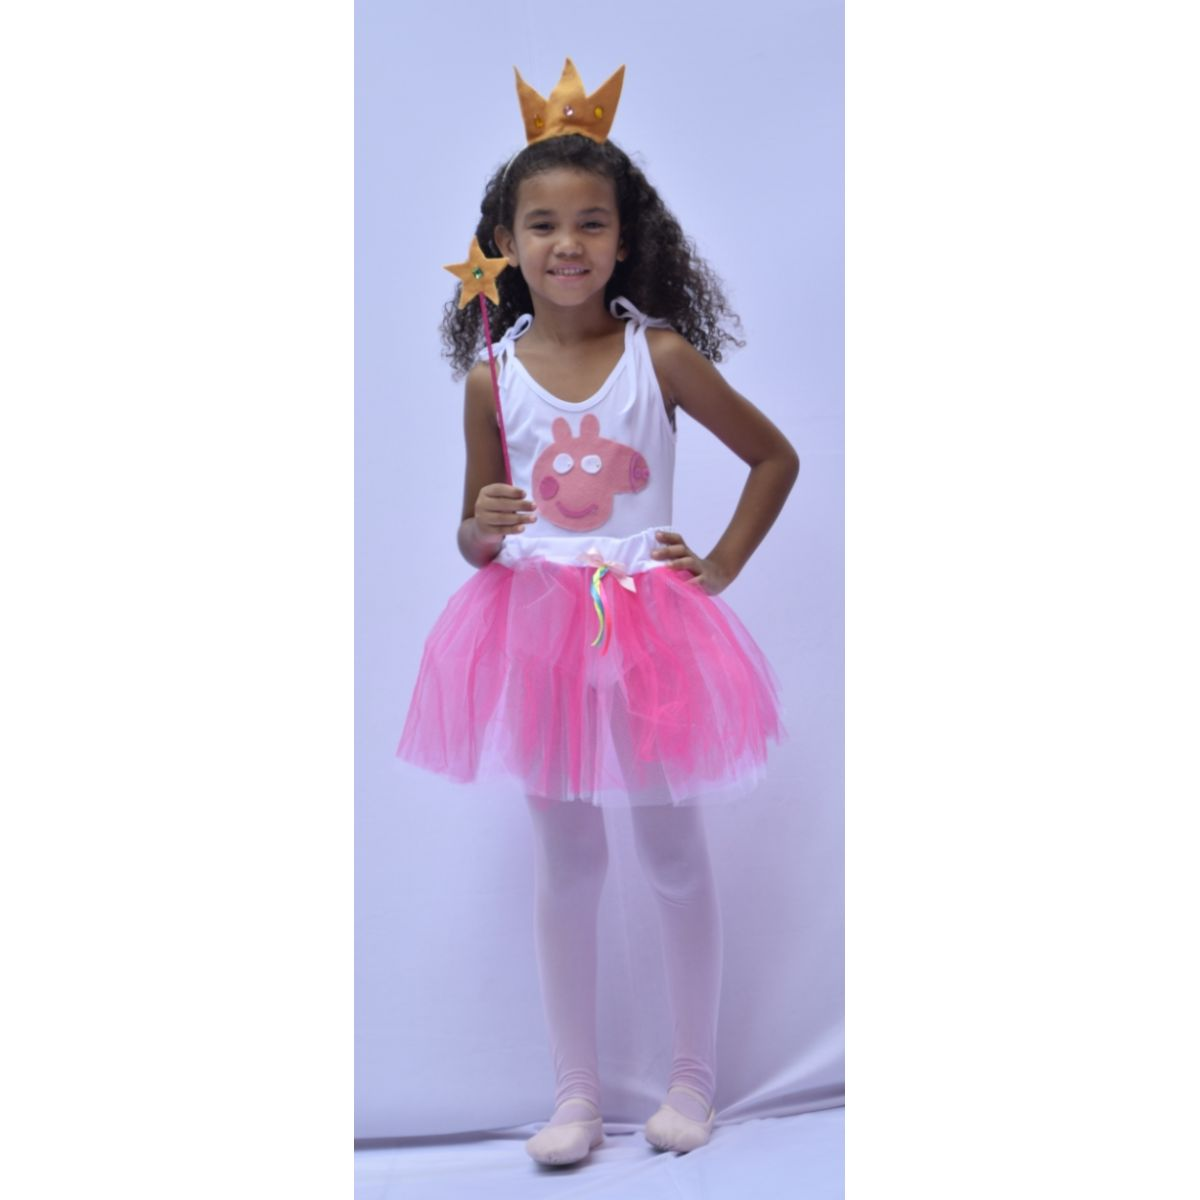 Fantasia Peppa Pig - Feminina - Infantil - Point Da Dança